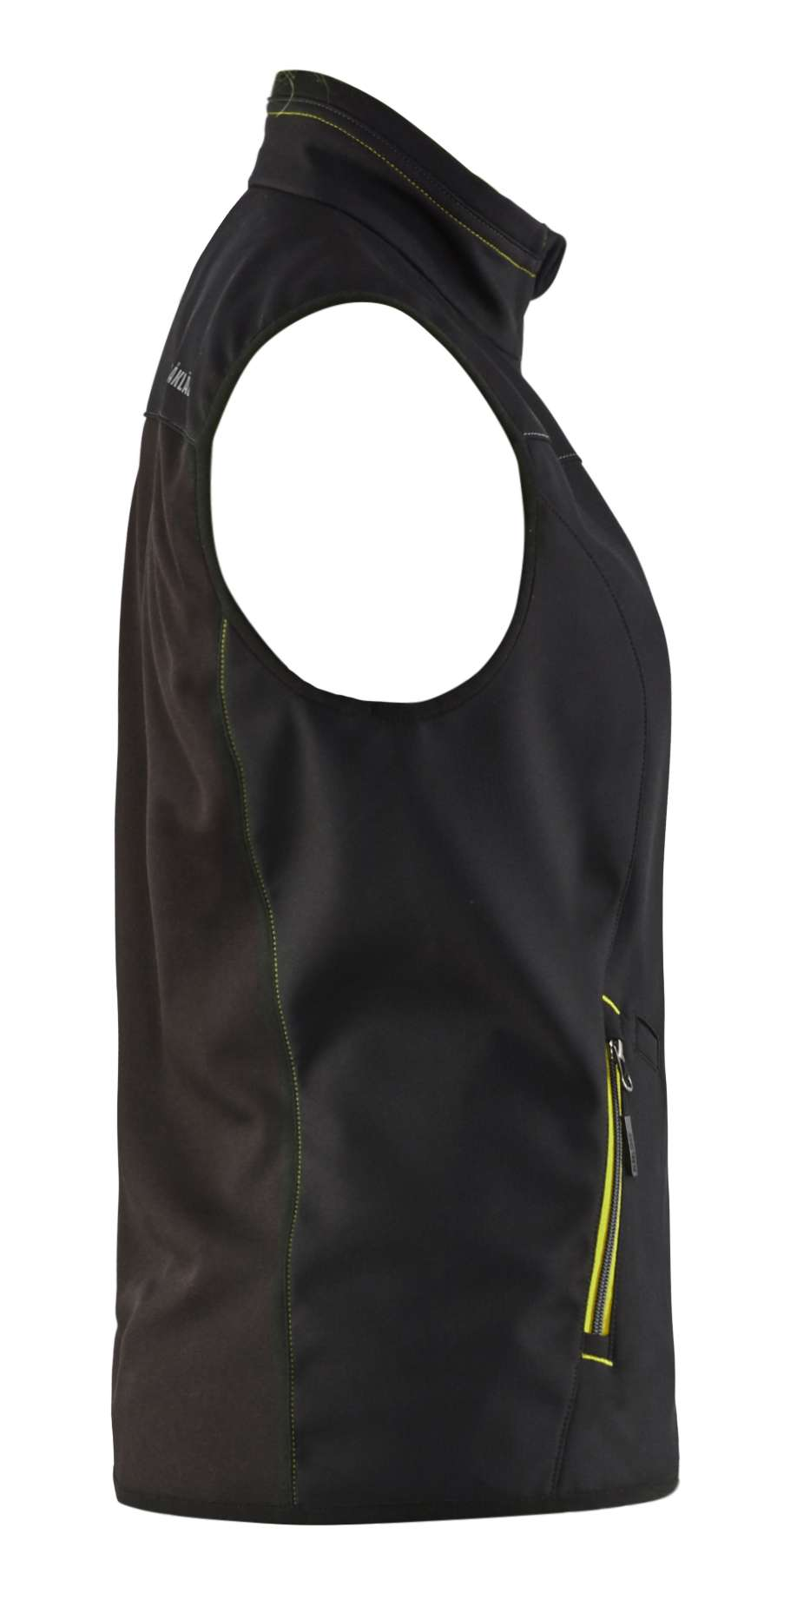 Blaklader Dames bodywarmers 38512516 zwart-fluo geel(9933)